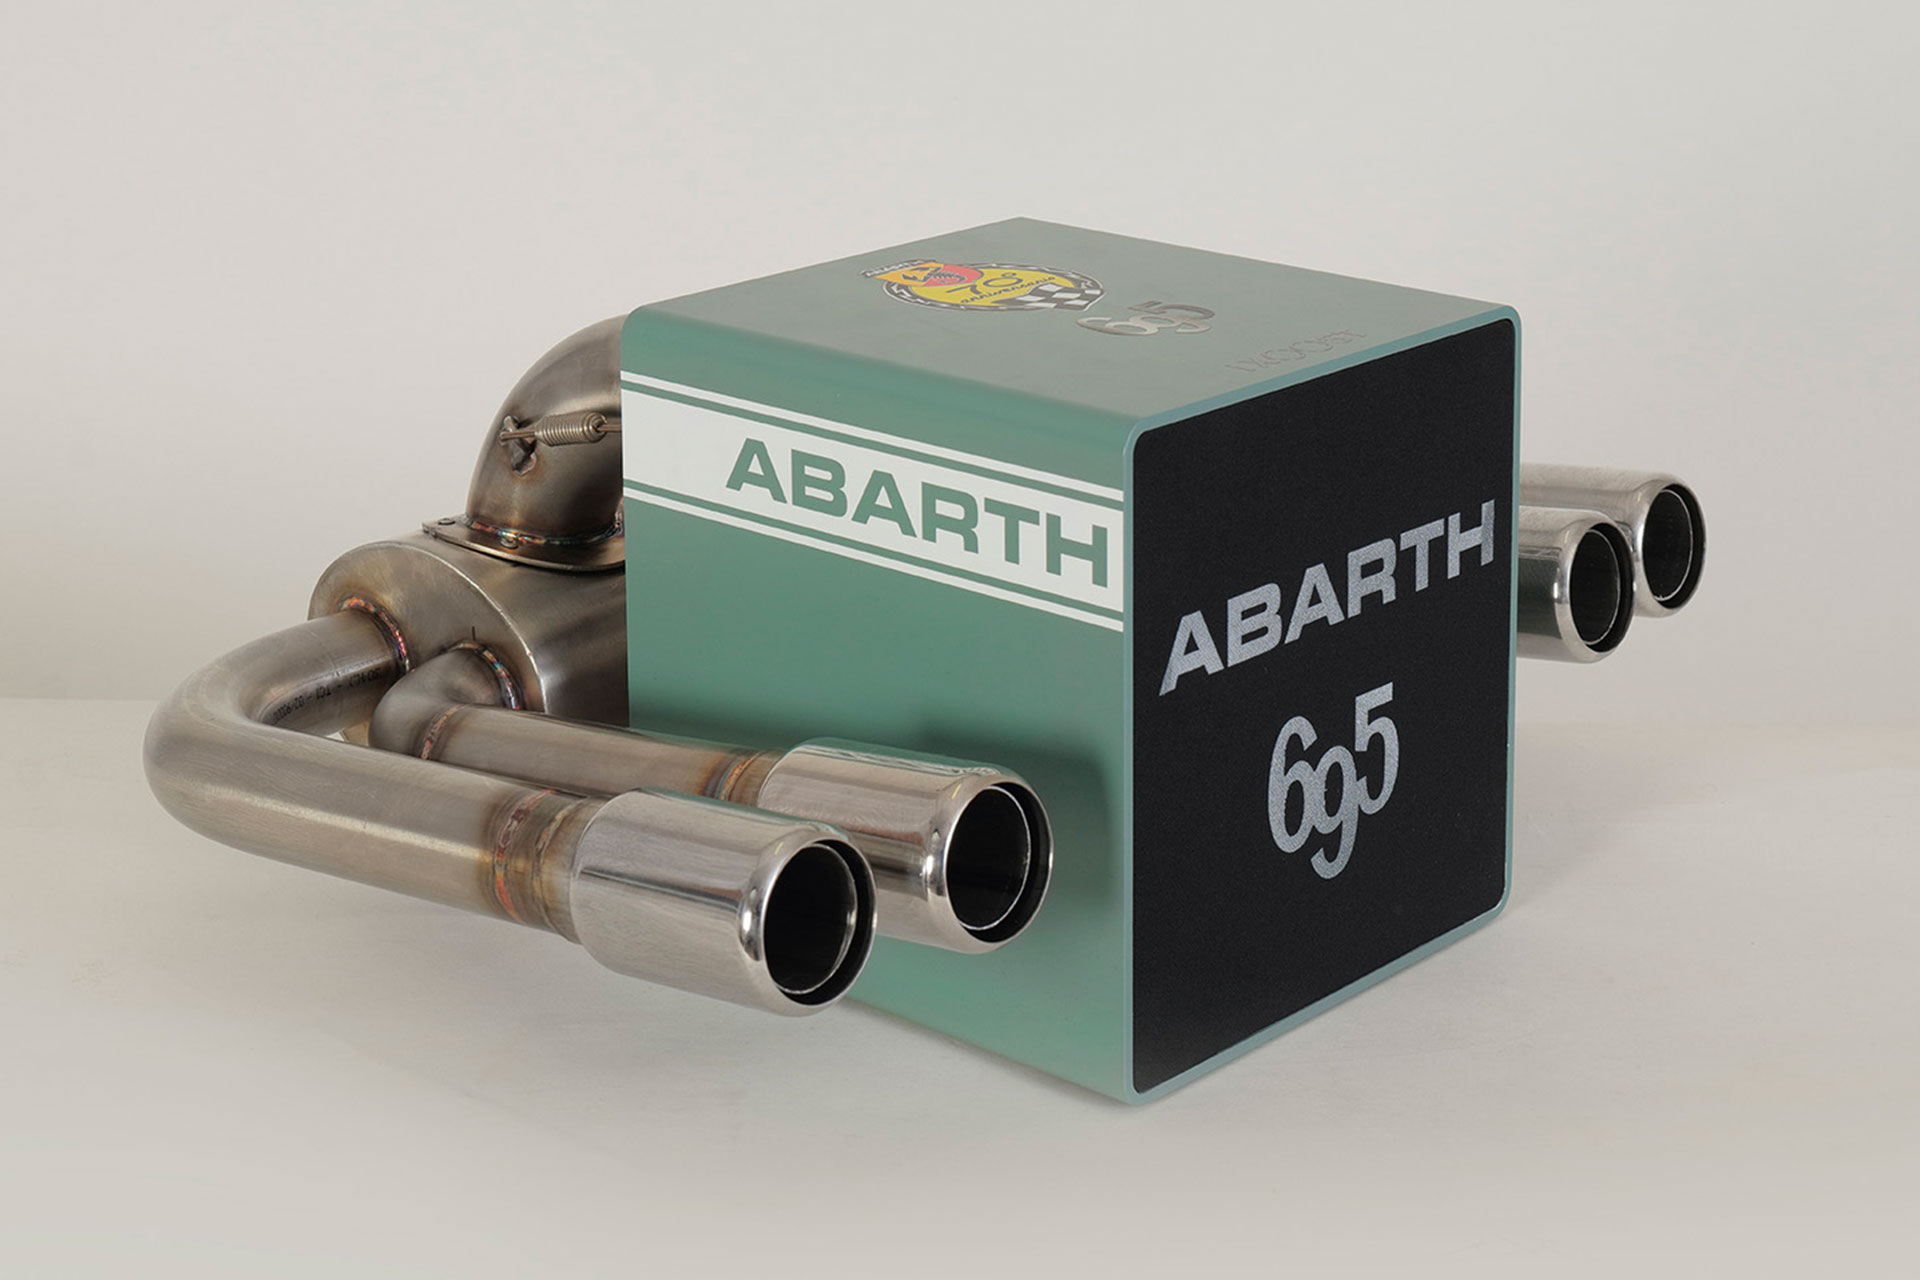 iXOOST KUBO ABARTH 695 impianto audio da casa